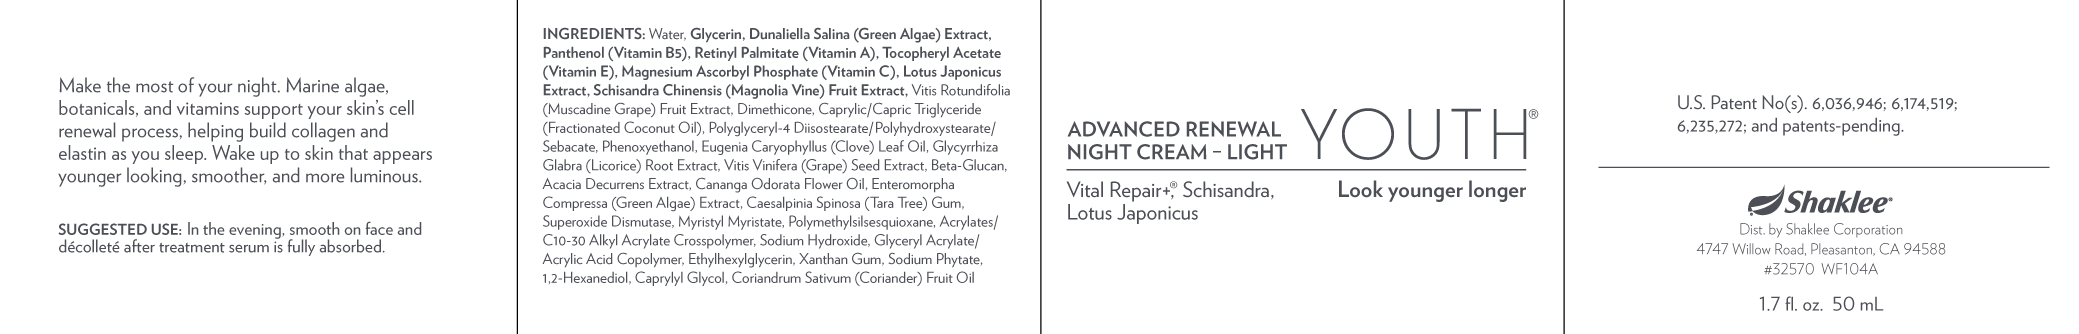 YOUTH Advance Renewal Night Cream-Light (32570)